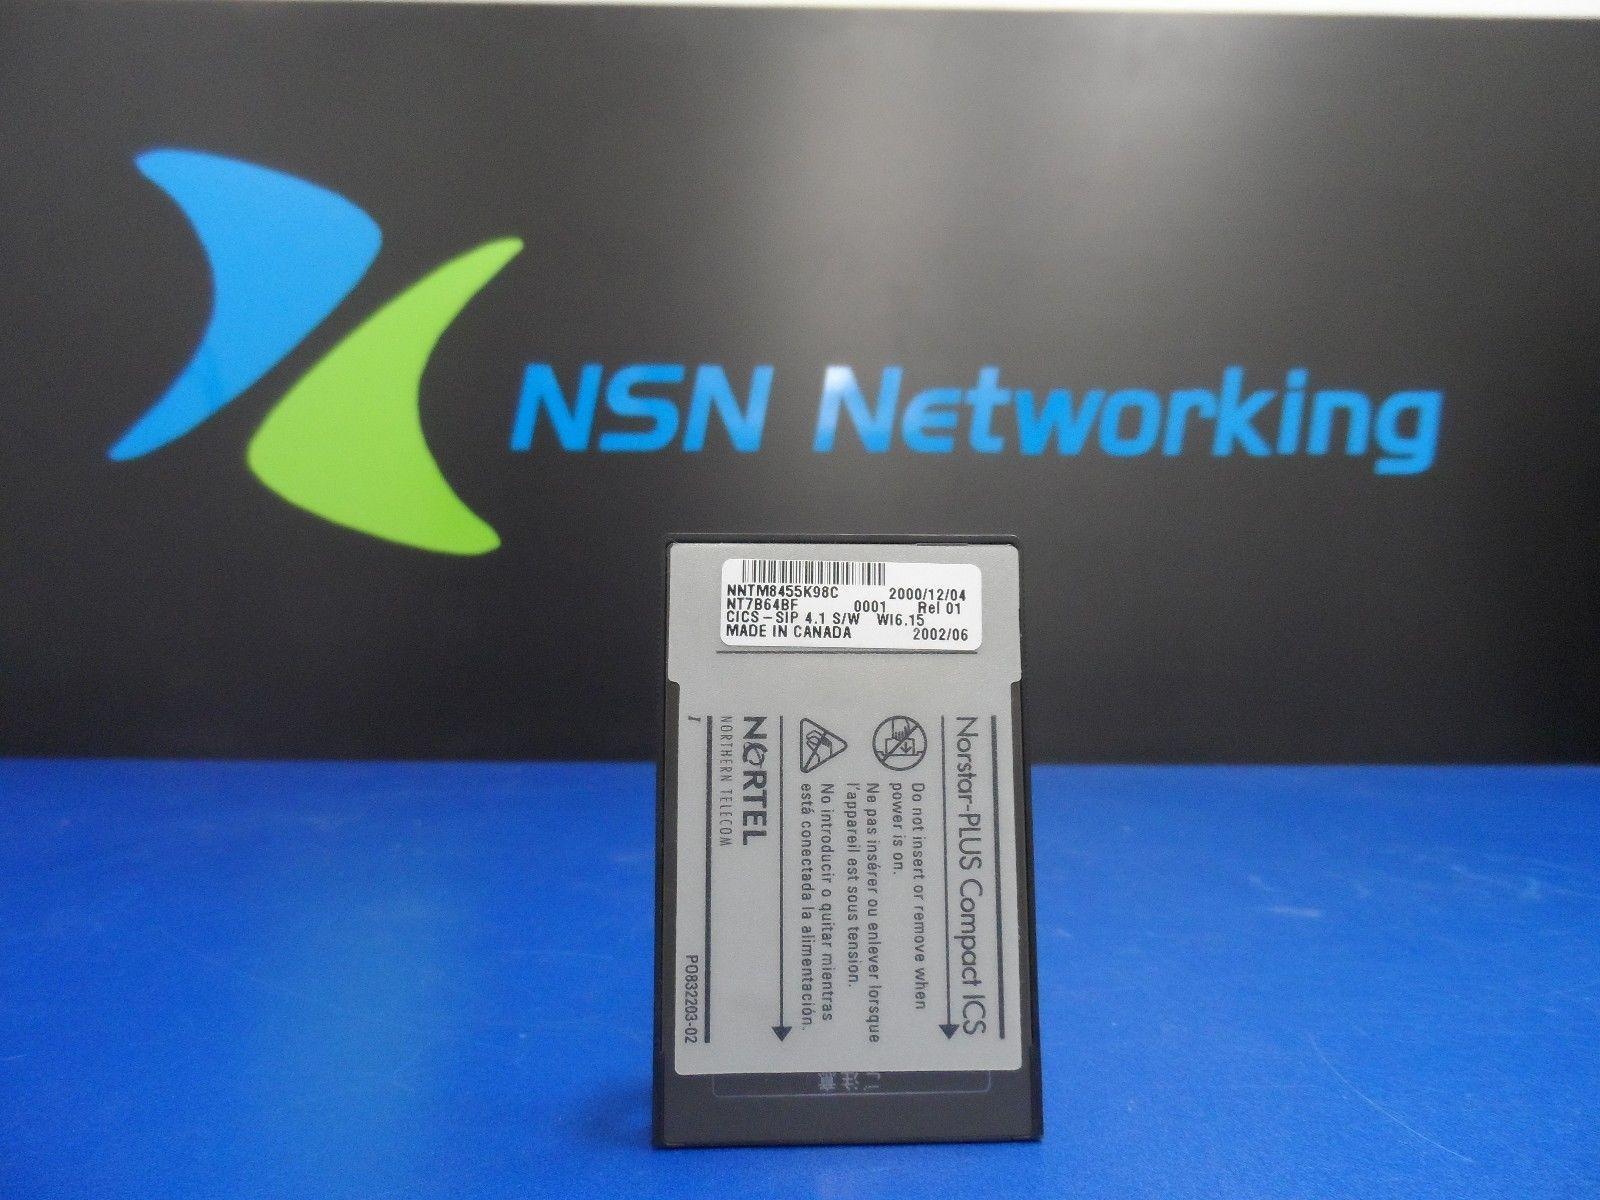 Nortel NT7B64BF REL 01 CICS SIP 4.1 S/W WI 06.15 CICS System Software